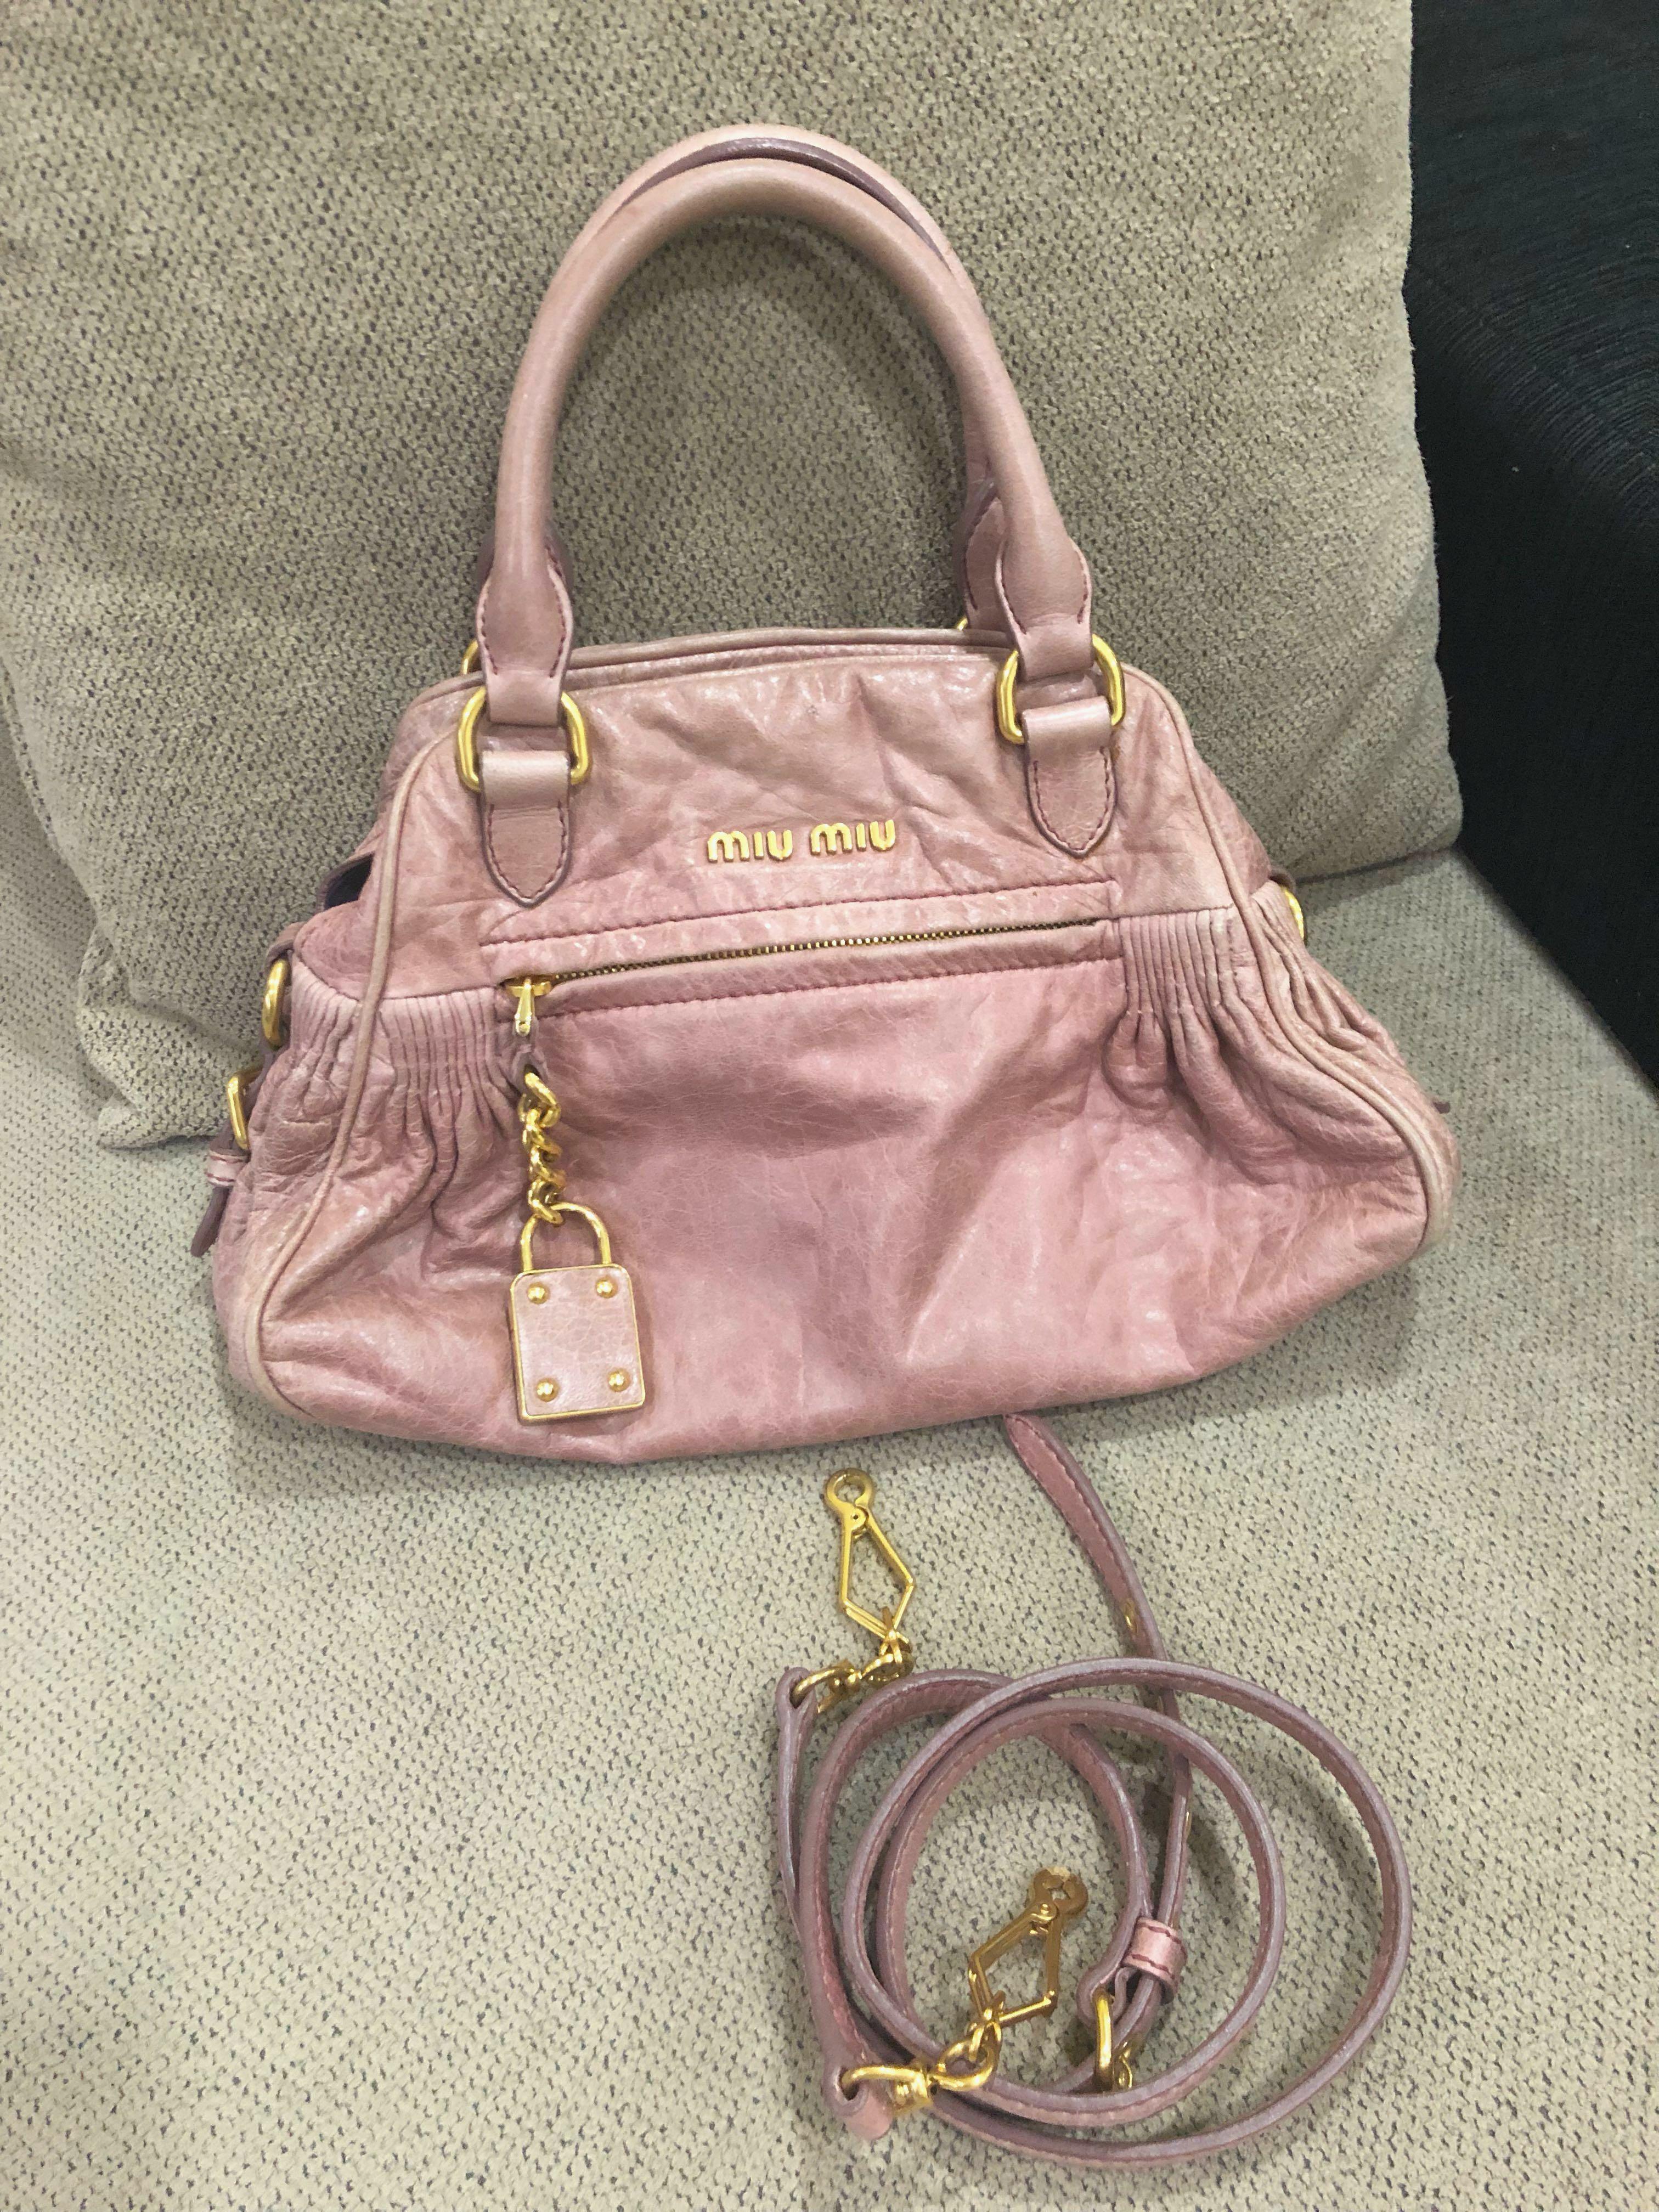 1e6693cb28a1 Home · Women s Fashion · Bags   Wallets · Handbags. photo photo ...